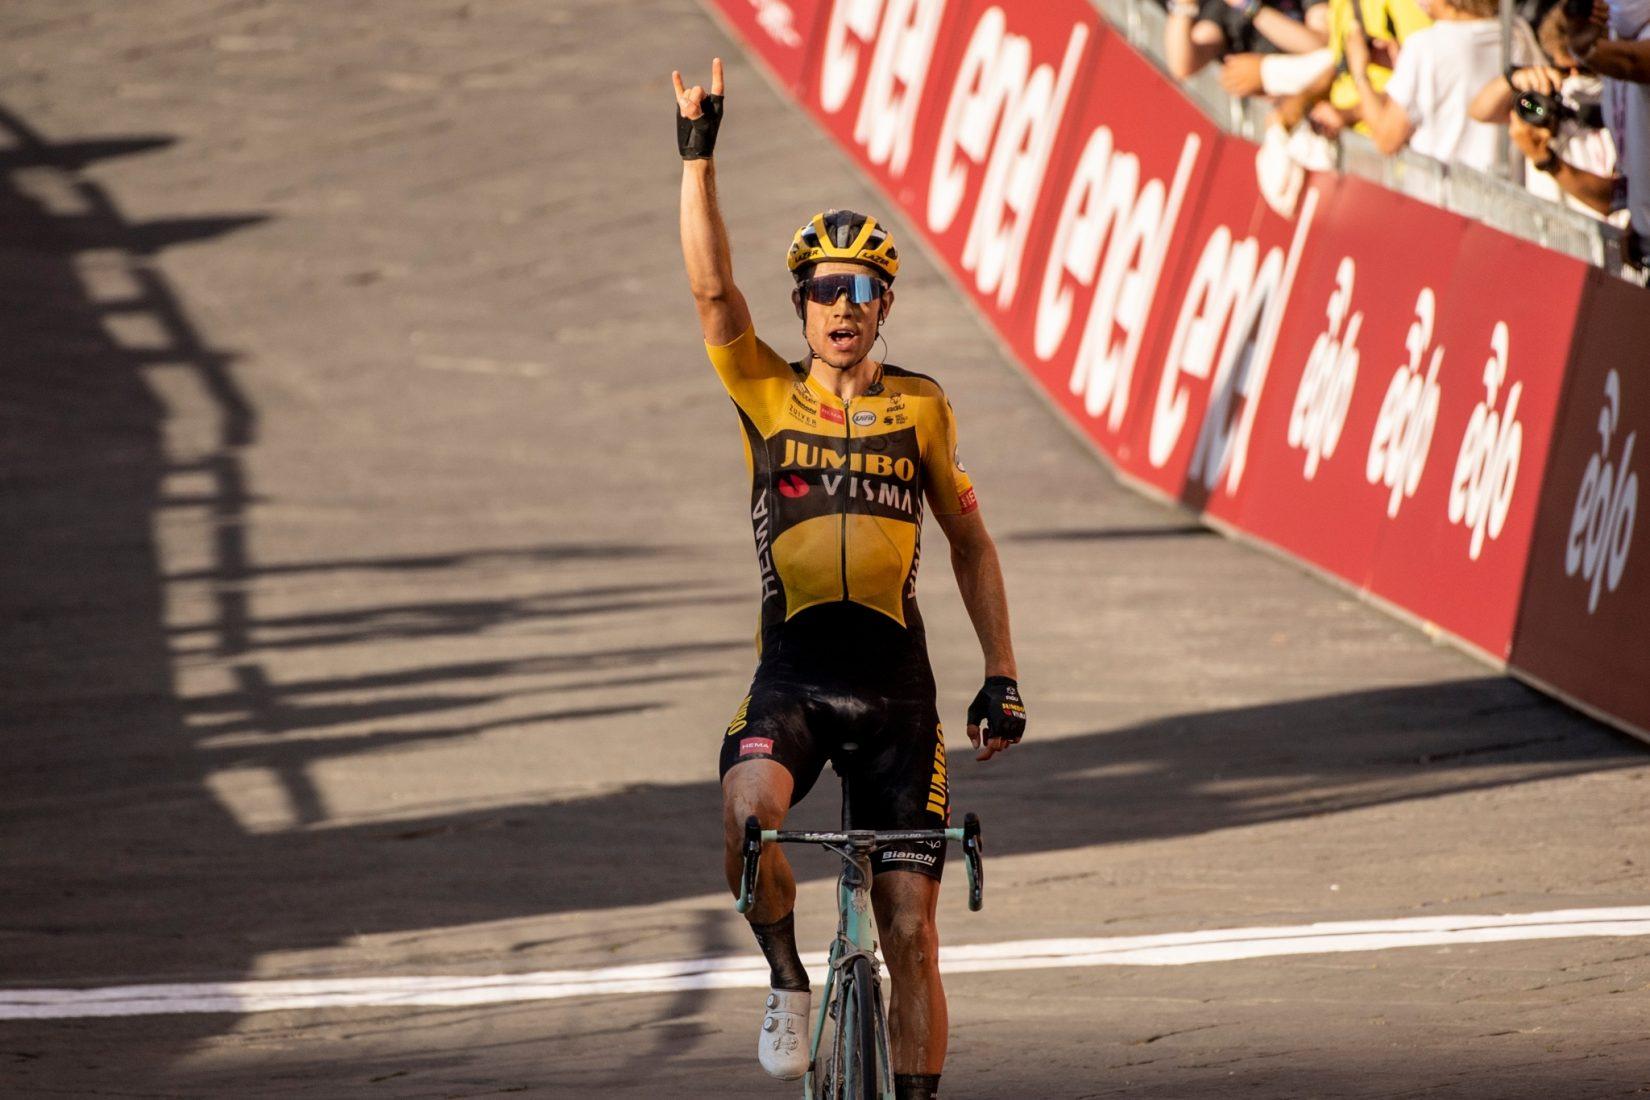 Ripartito il WorldTour, rinato Van Aert